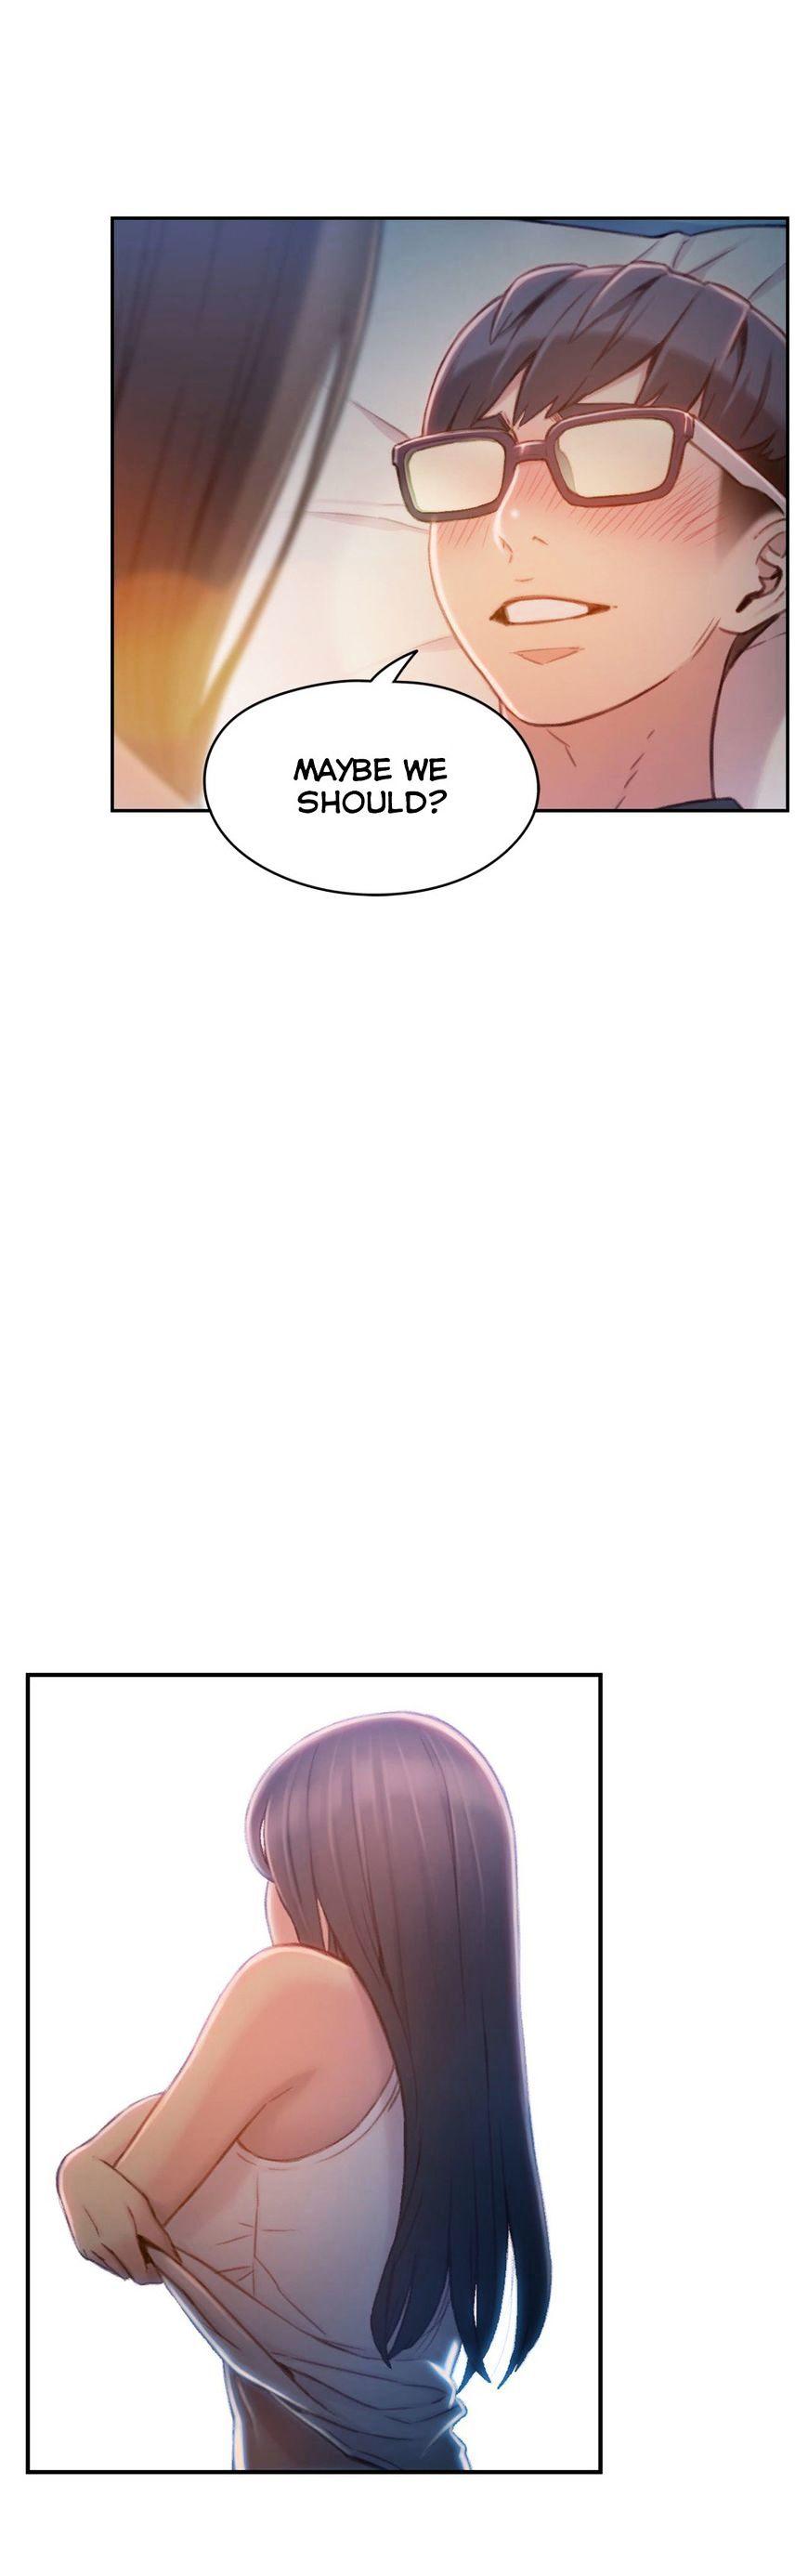 Sweet Guy Chapter 74 Full Manga Read Scan Image 13